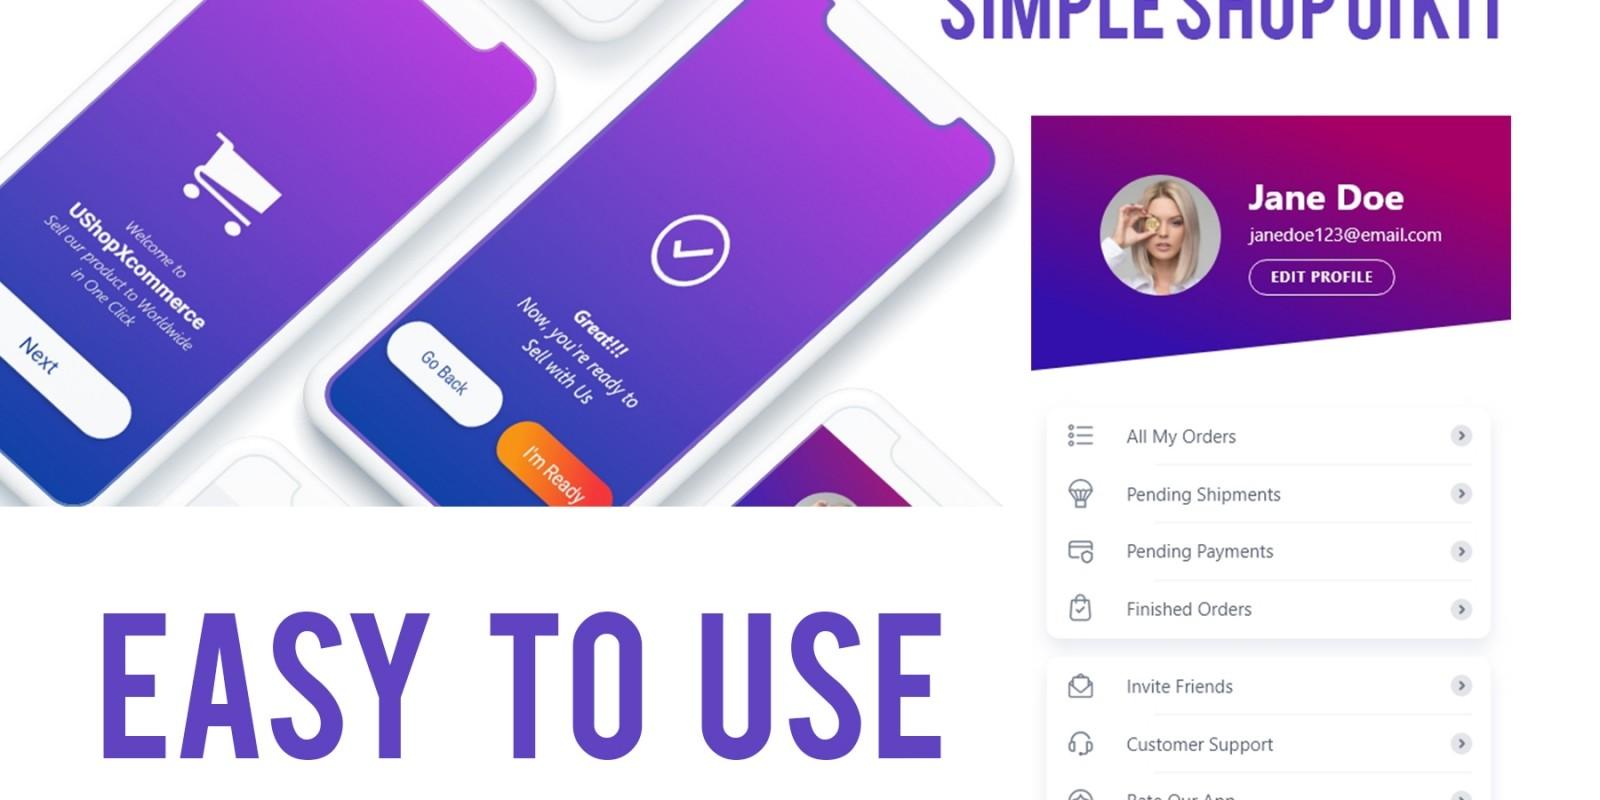 Ushop Xcommerce E-Commerce App Ui Kit